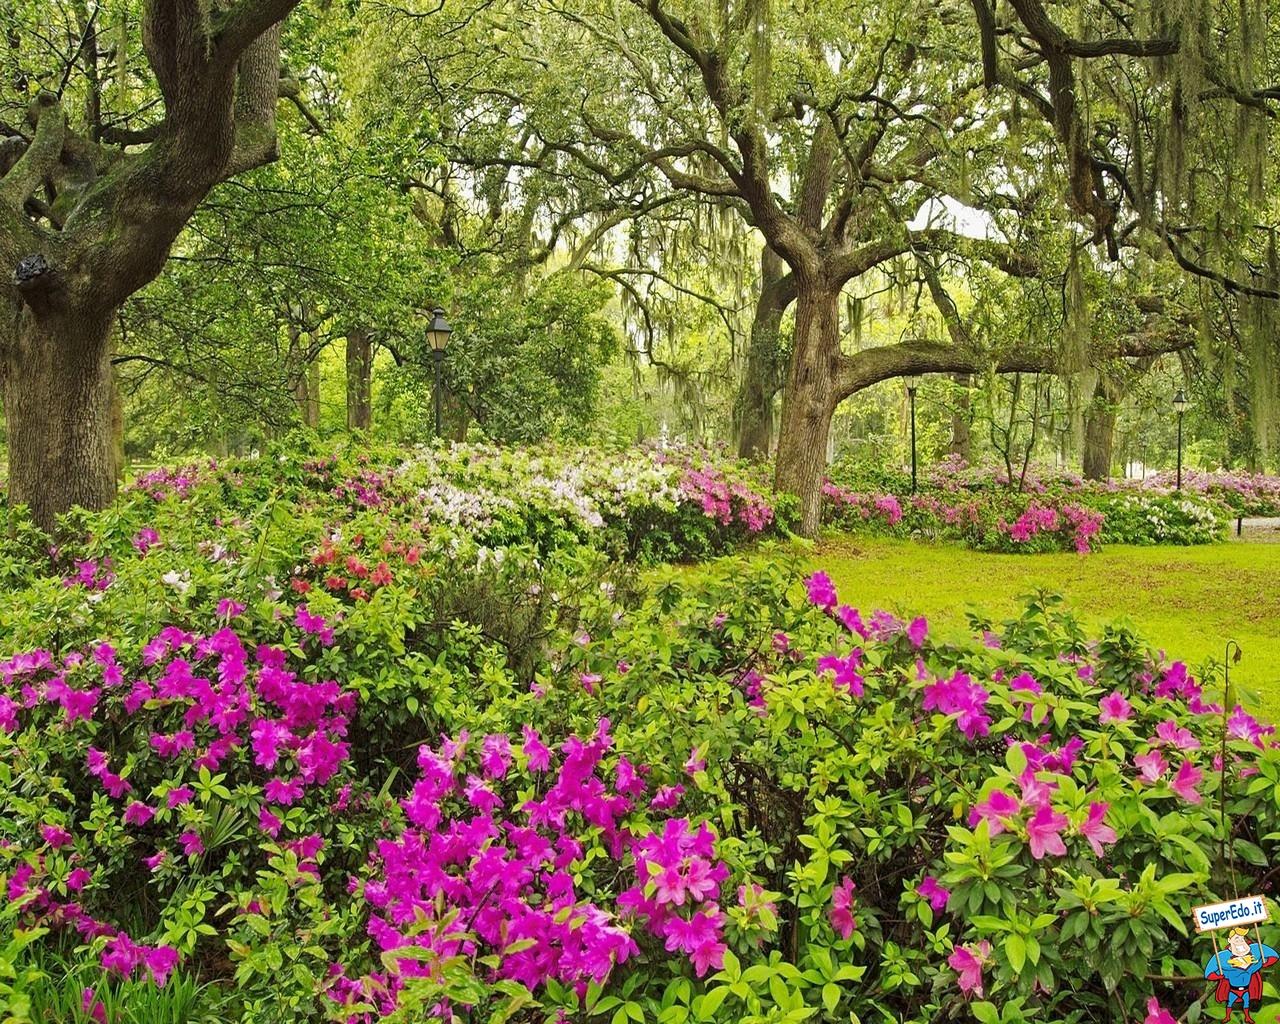 Sfondi Fiori Giardini Botanici 83 1280x1024